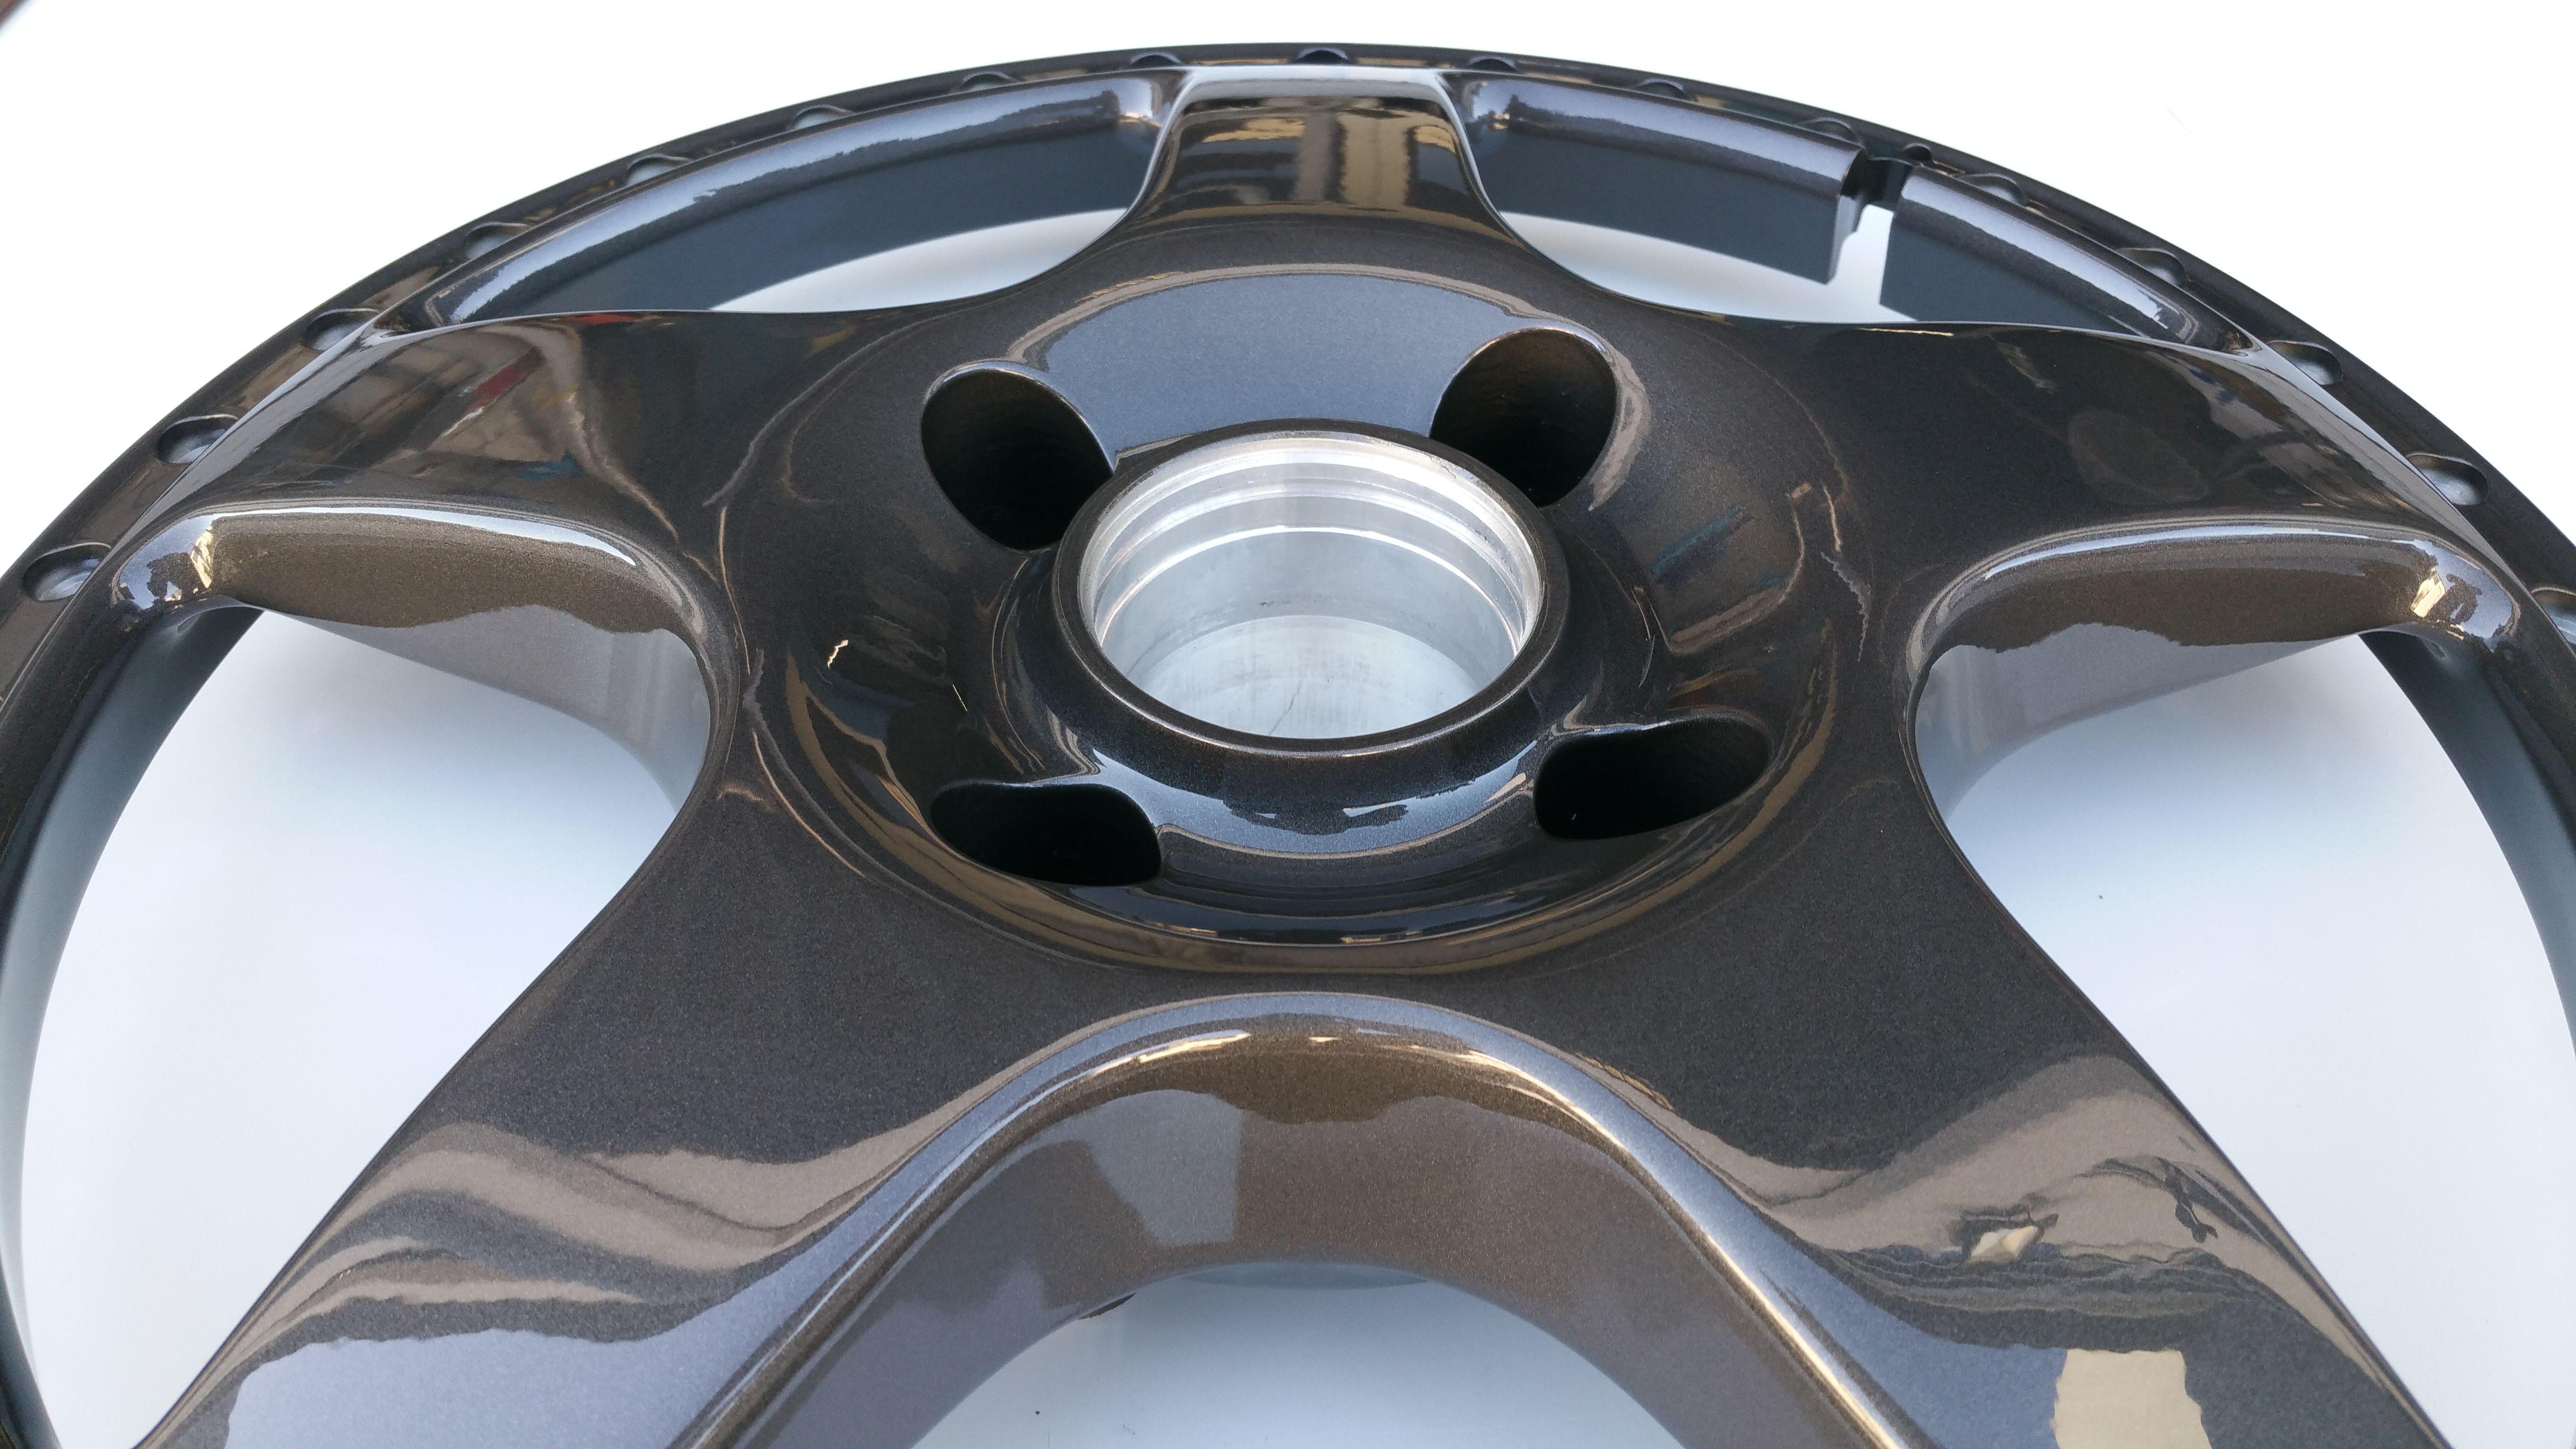 Simmons Wheels FR-18 painted in Simmons Gunmetal Grey  This